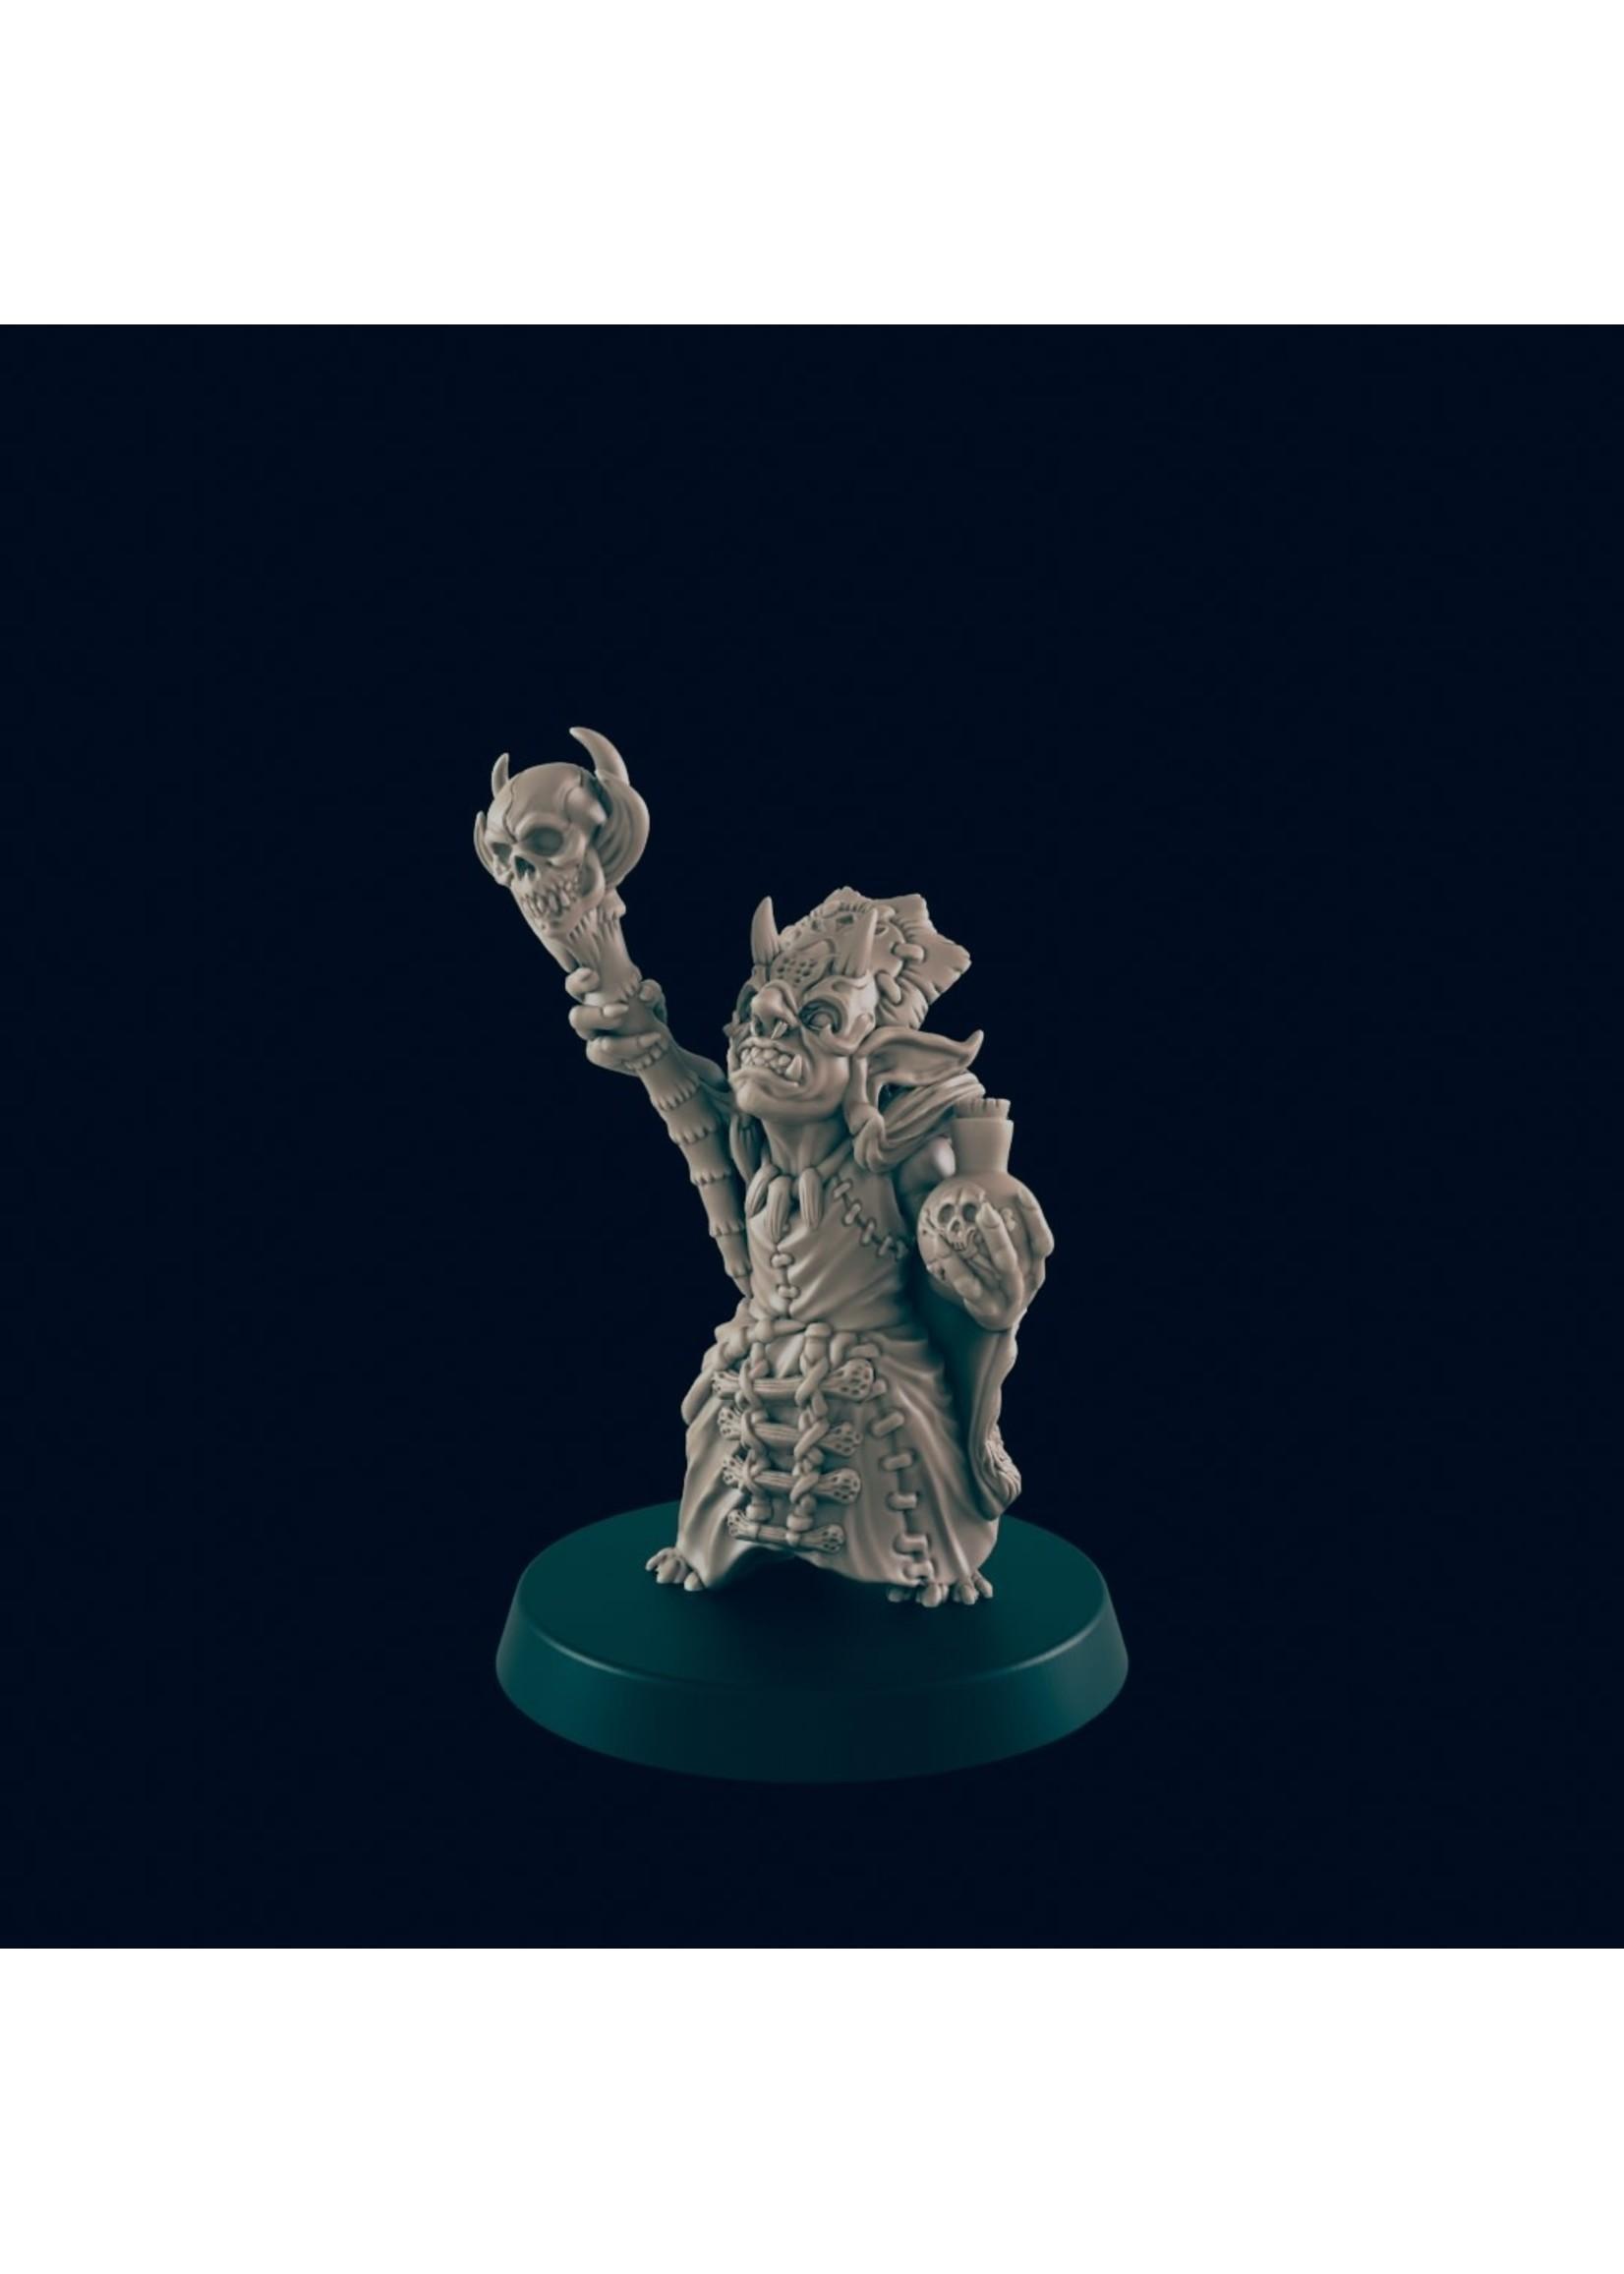 3D Printed Miniature - Goblin Shaman - Dungeons & Dragons - Beasts and Baddies KS